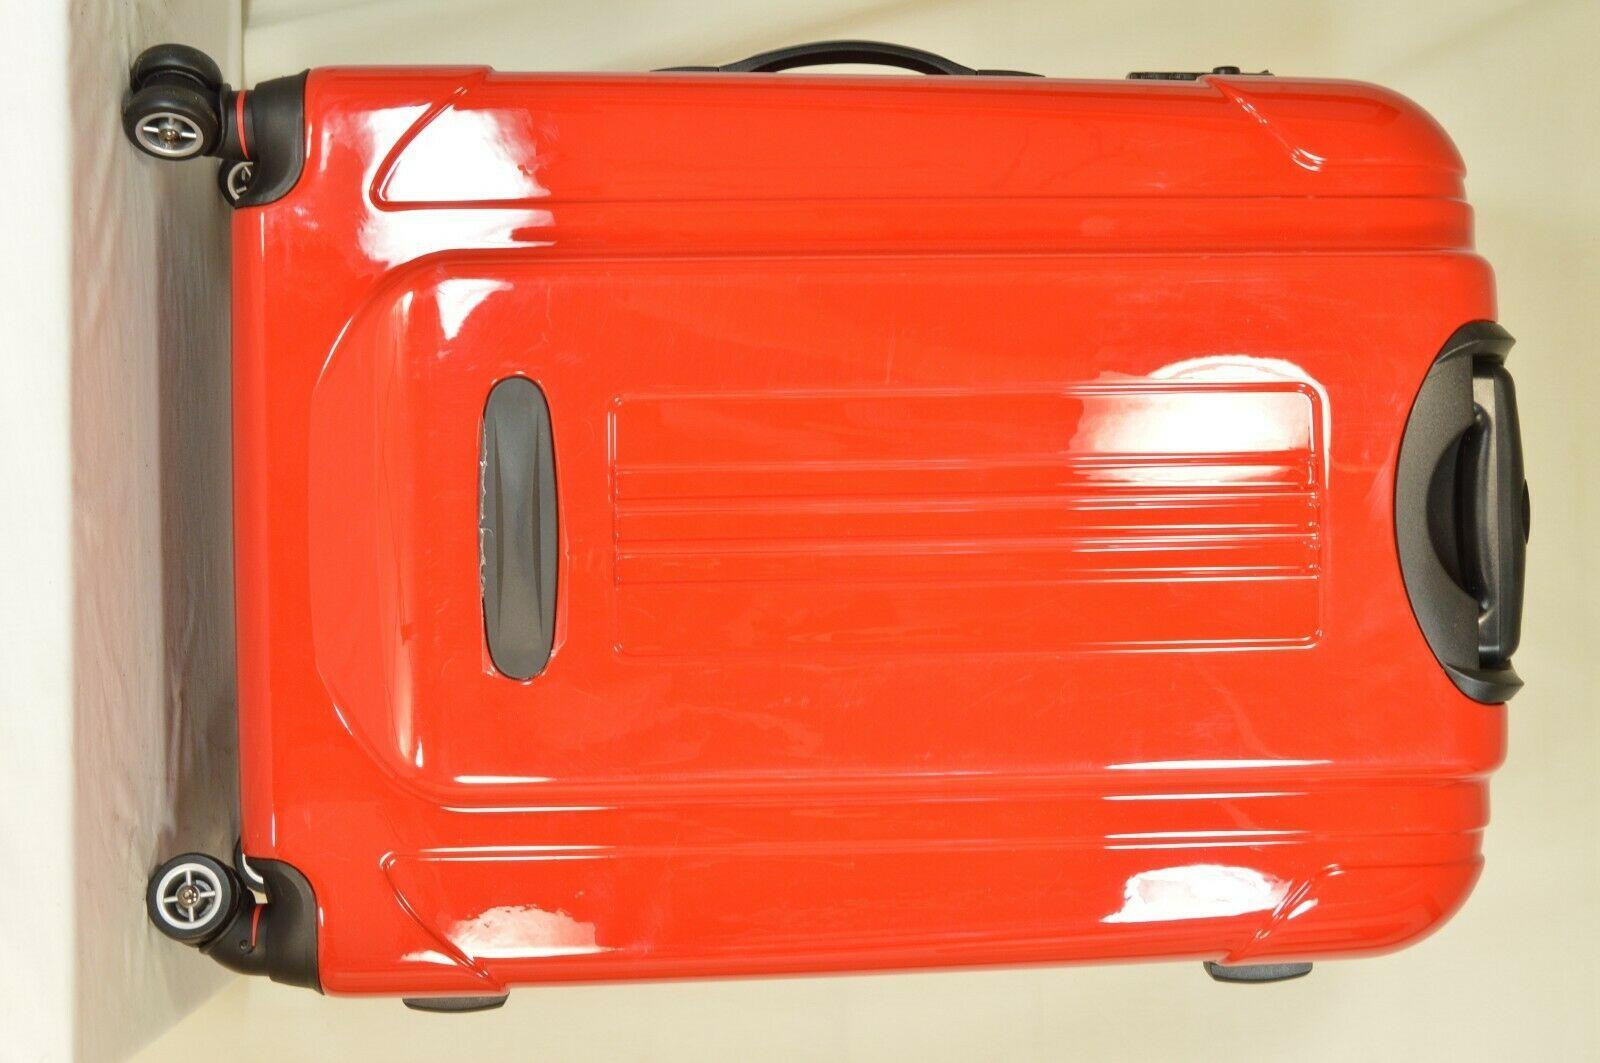 "Traveler's Choice 29"" Sedona new spinner red polycarbonate shell combo lock image 7"